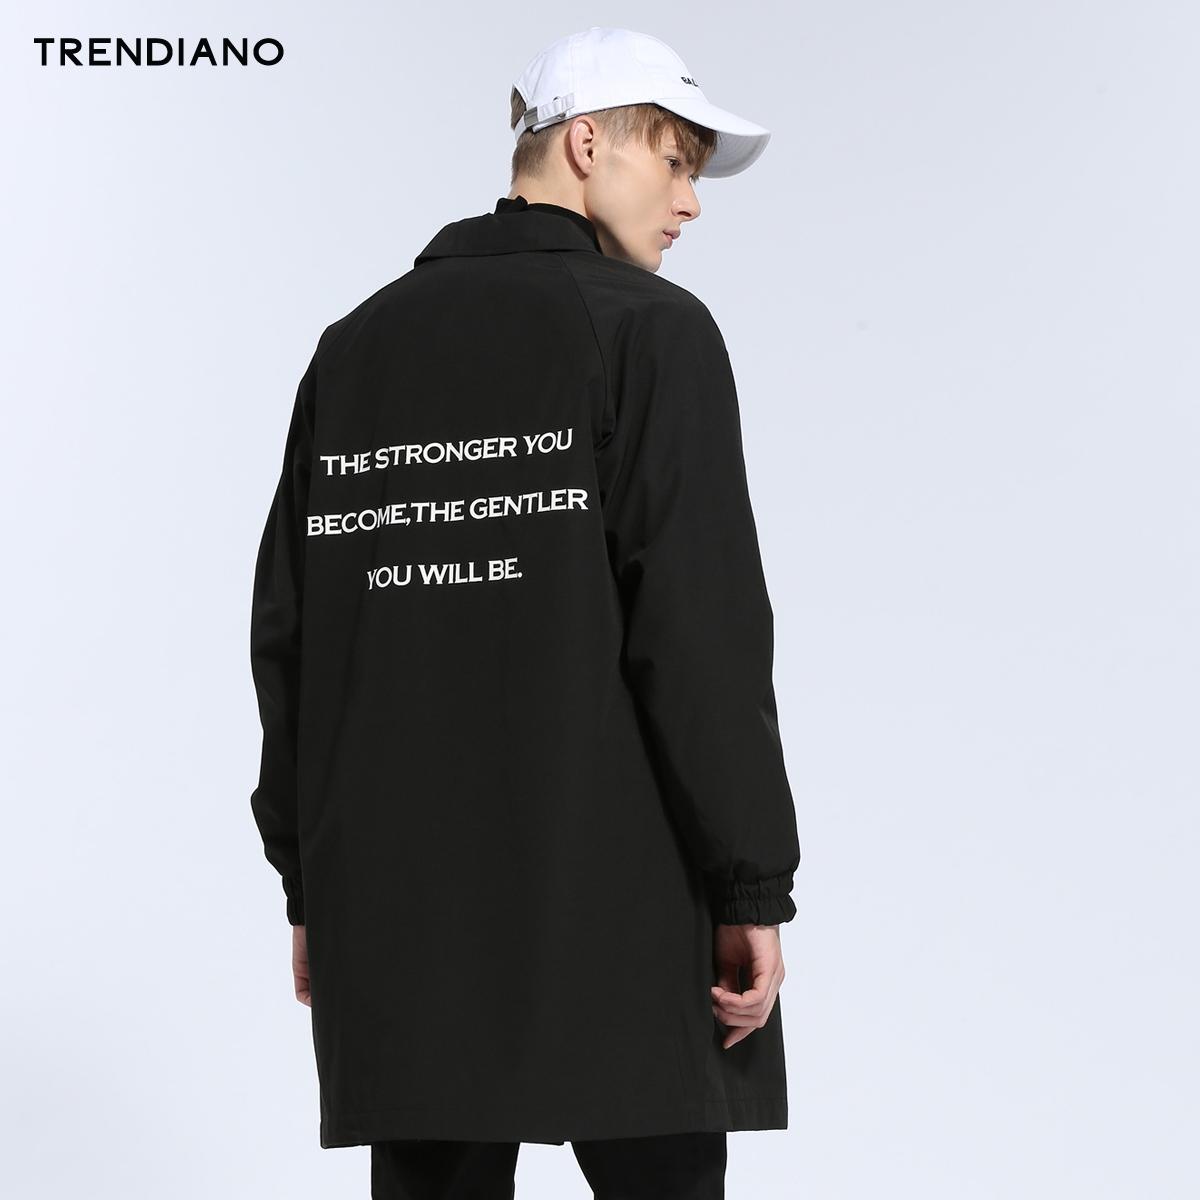 TRENDIANO男装冬装潮休闲字母翻领长款长袖风衣外套3JC4044470